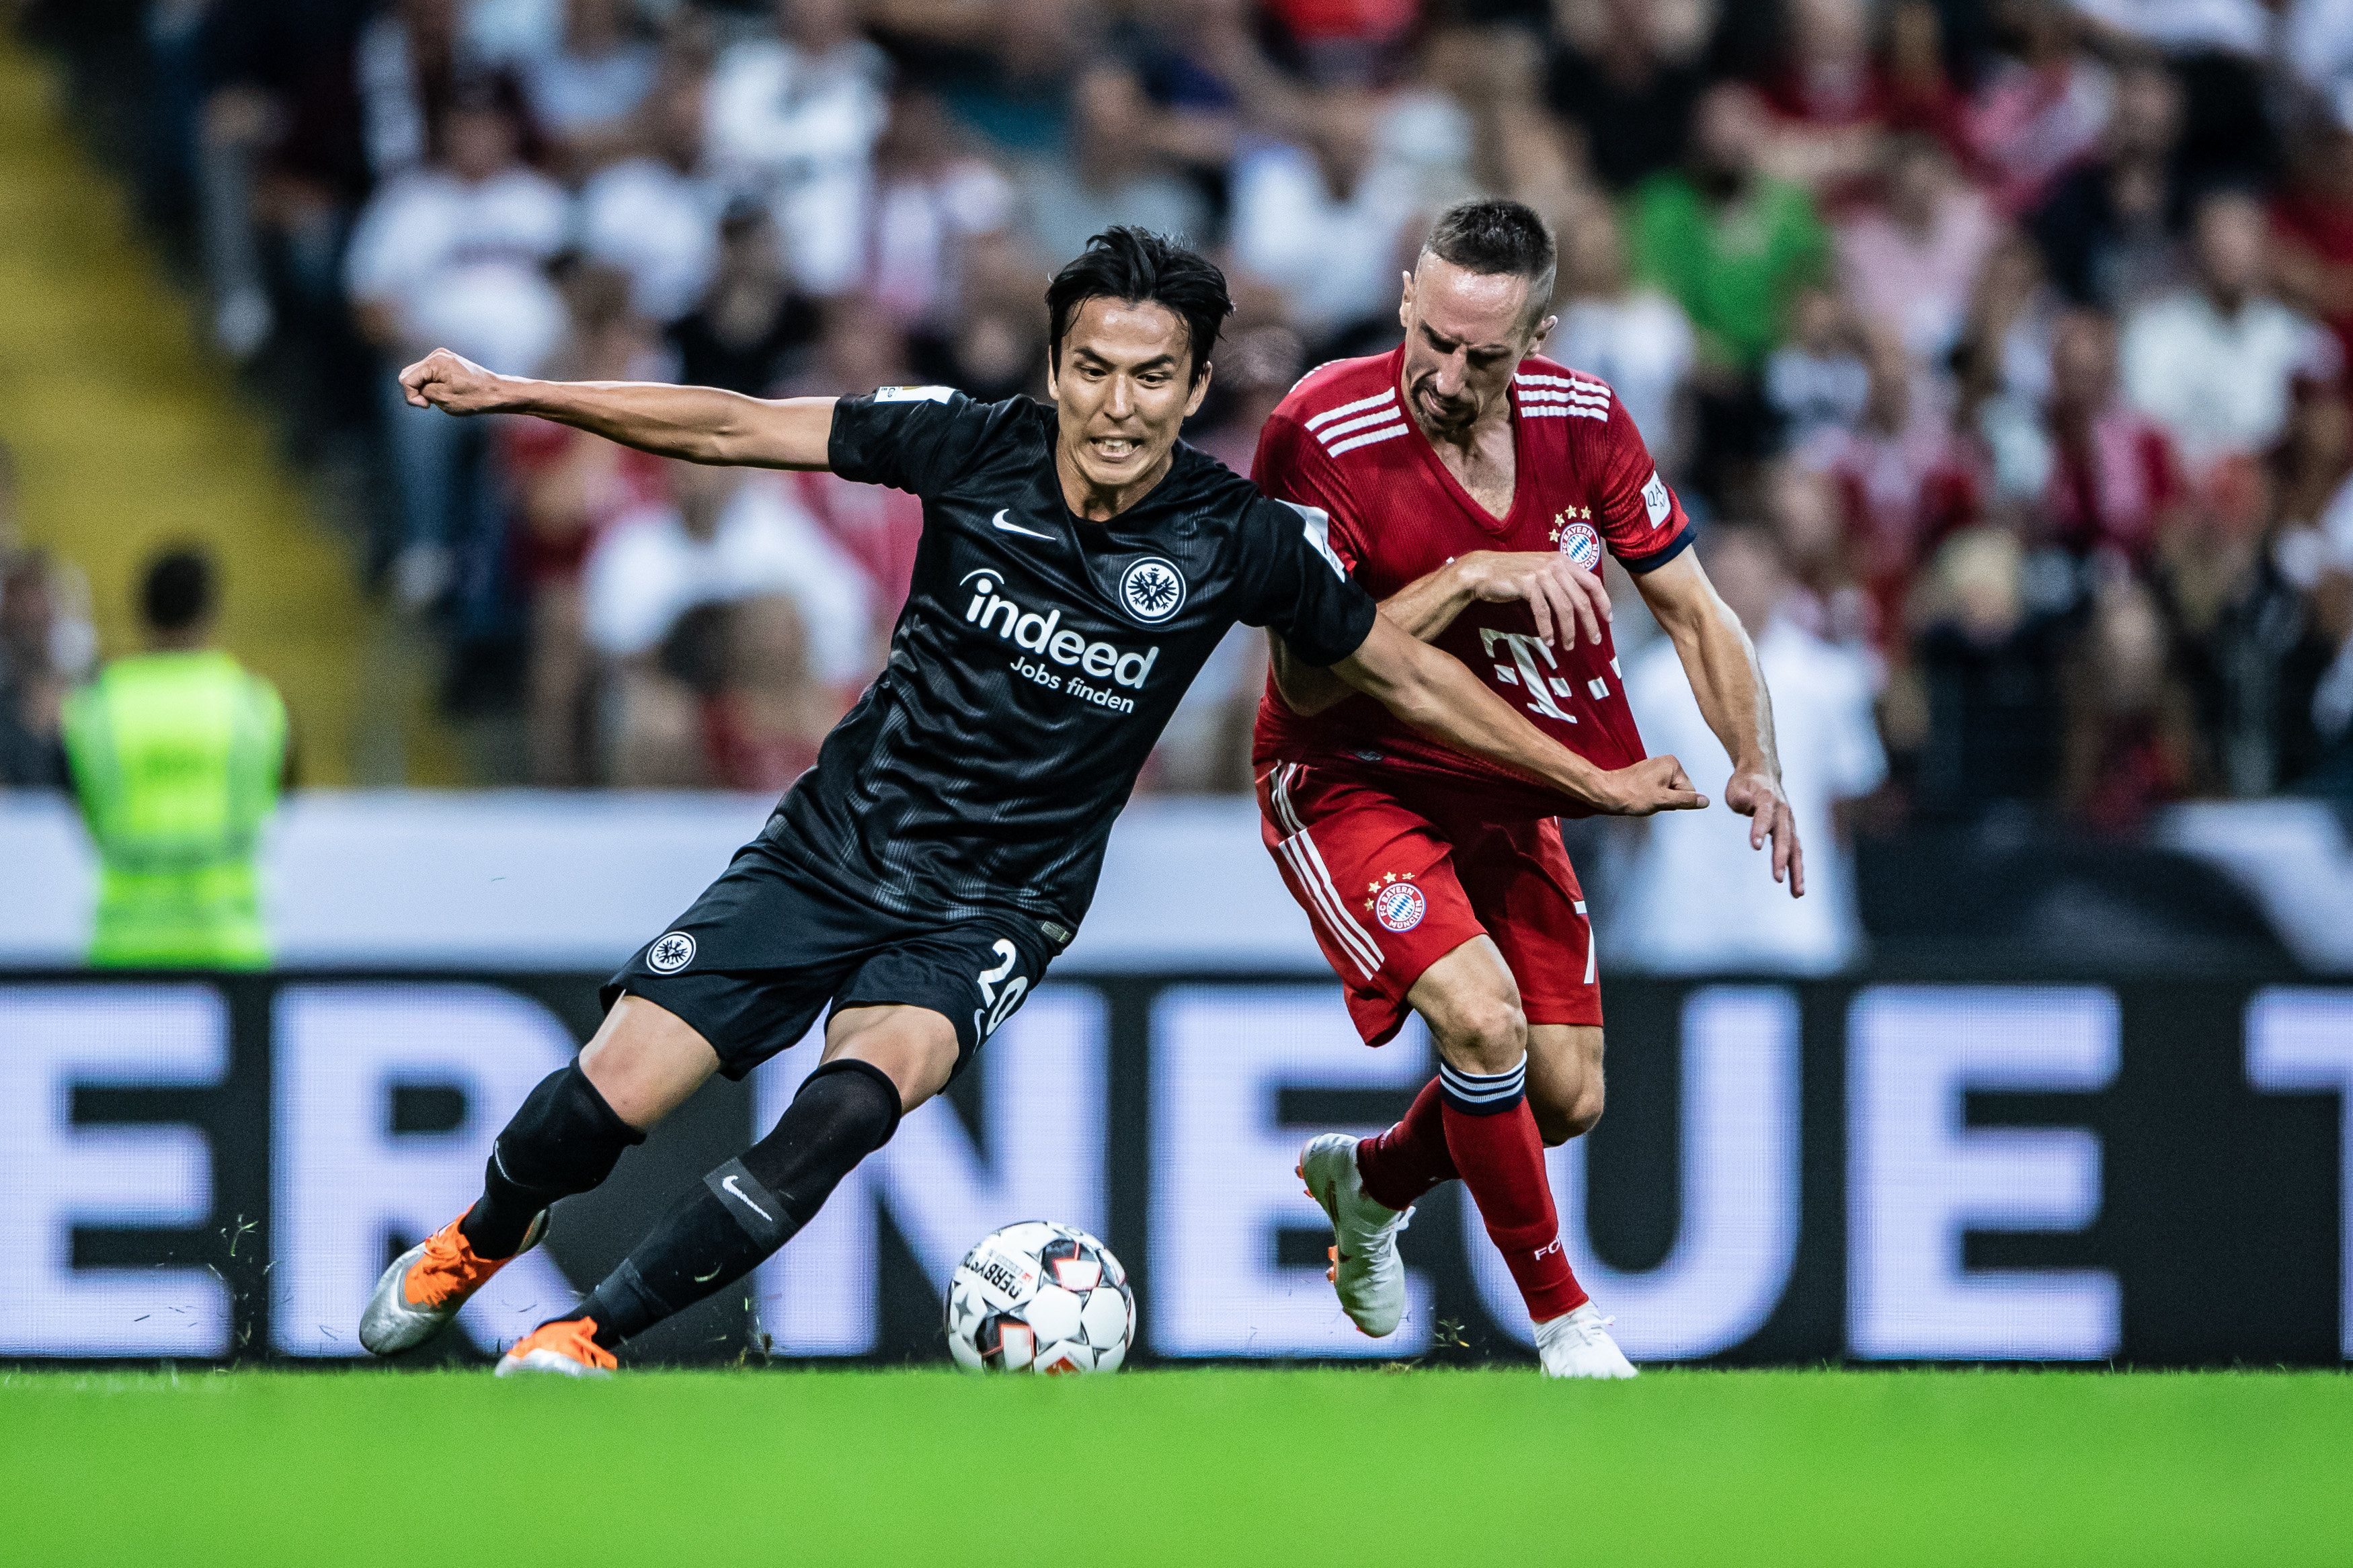 DFB-Pokal im Live-Stream: SSV Ulm – Eintracht Frankfurt online